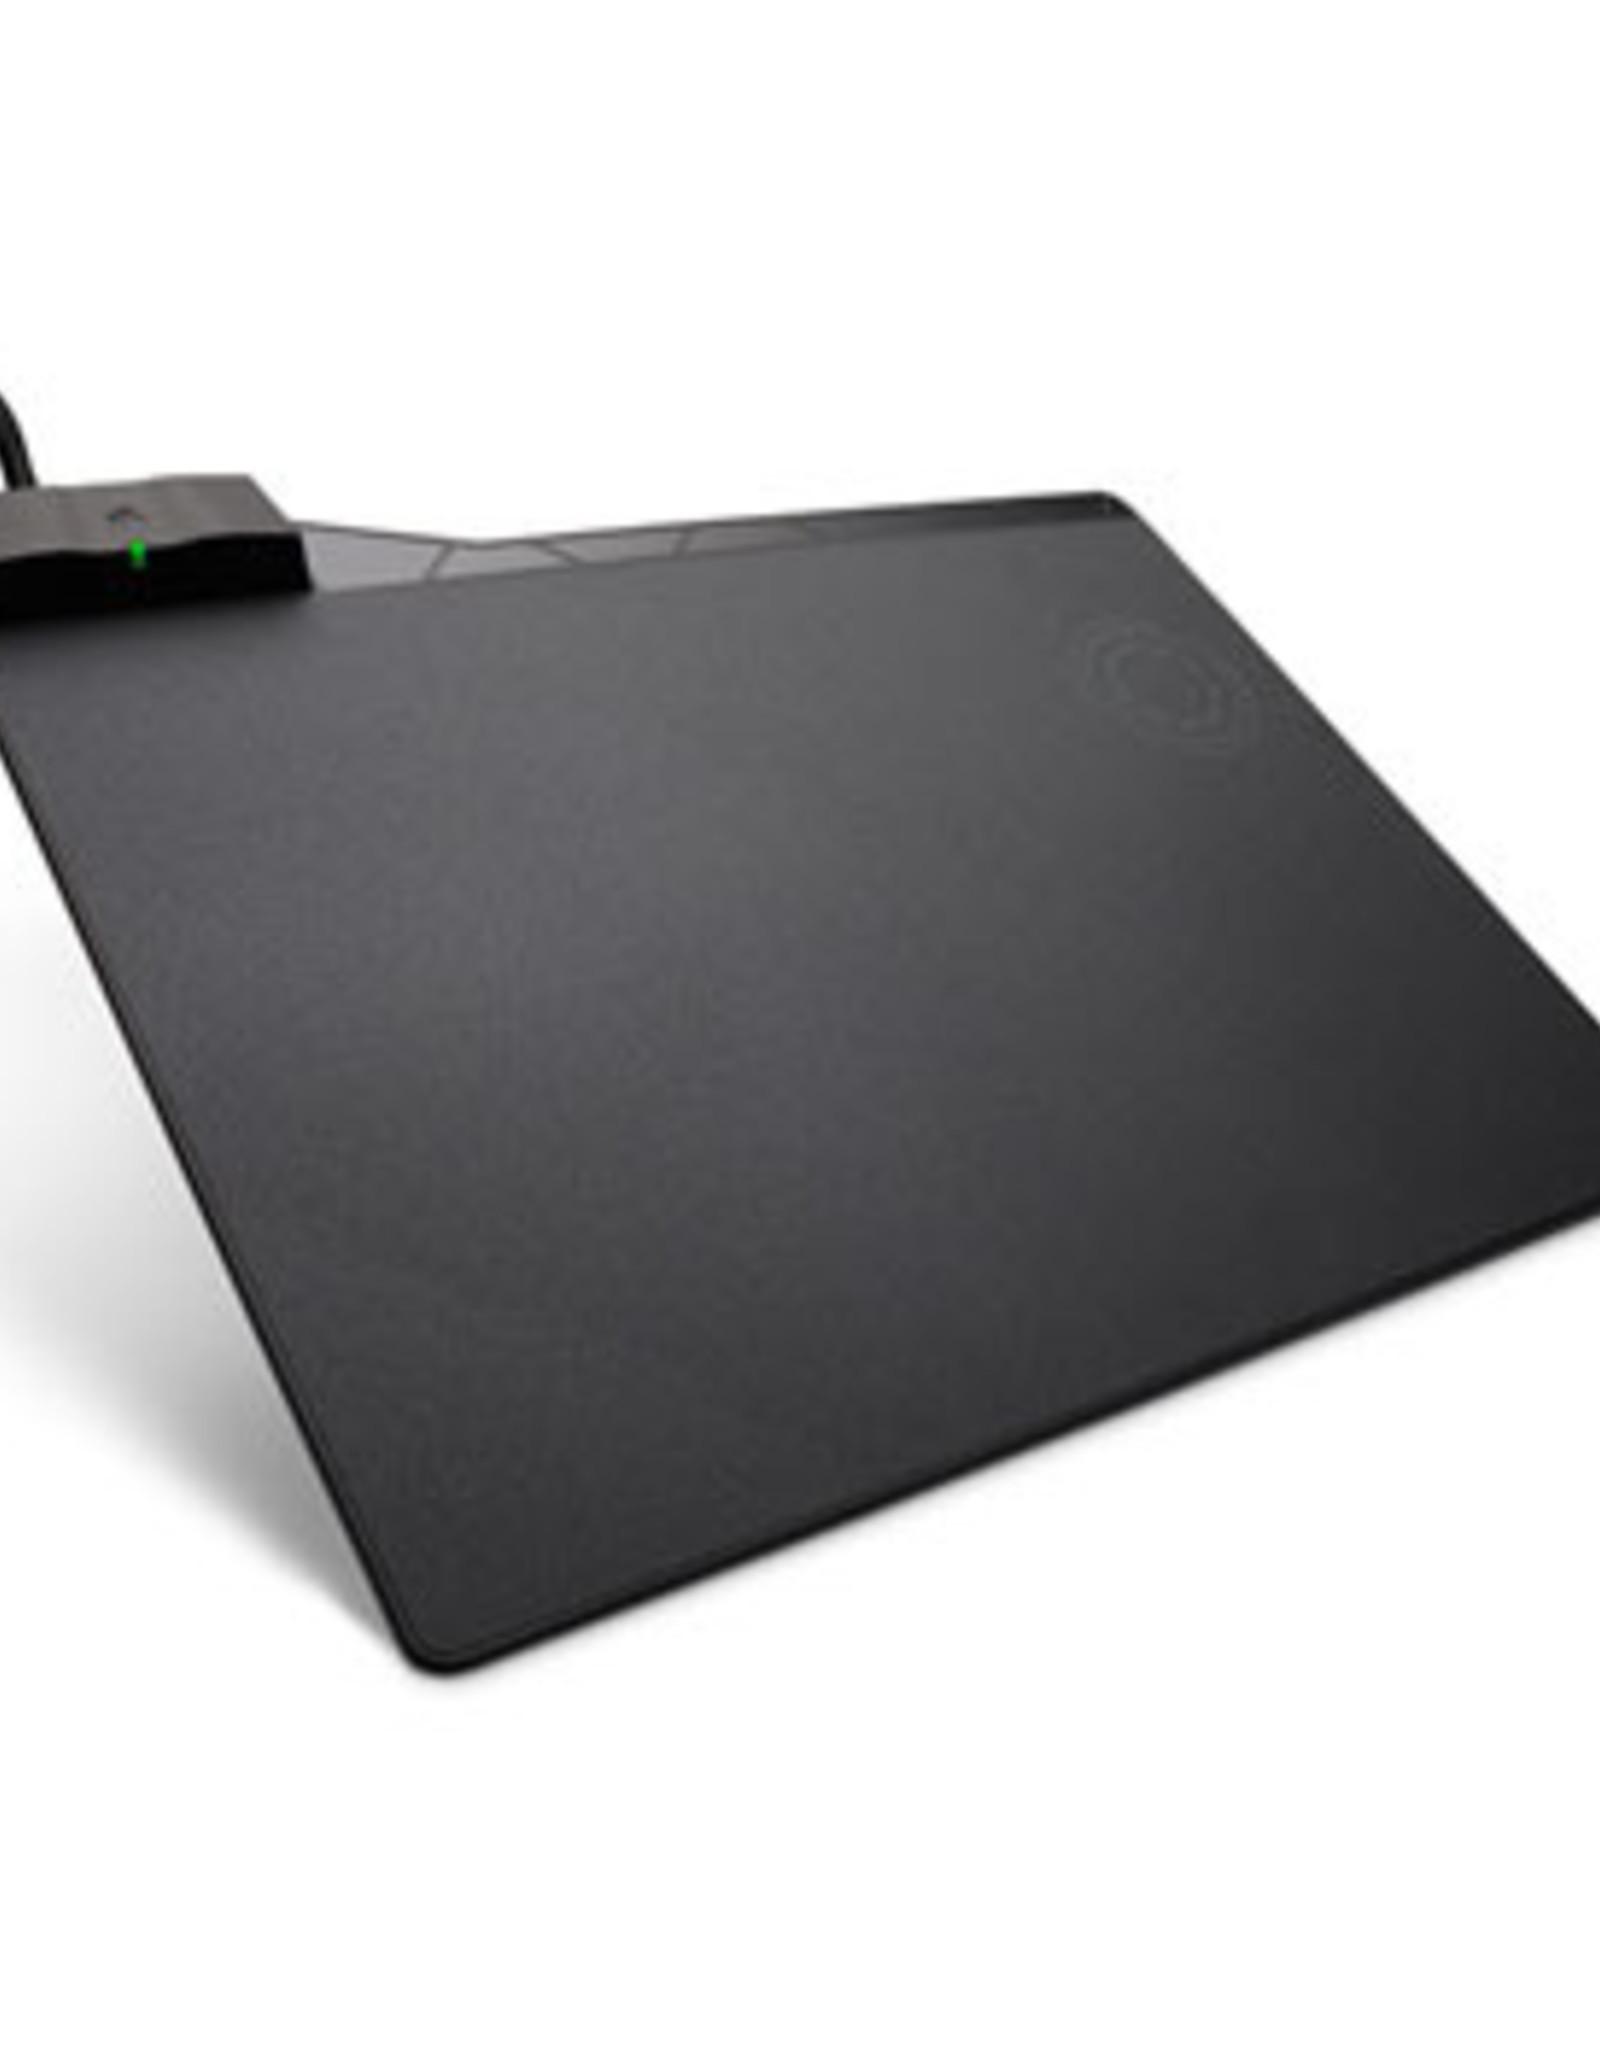 Corsair Corsair | MM1000 Qi Wireless Charging Mouse Pad - Black CH-9440022-NA